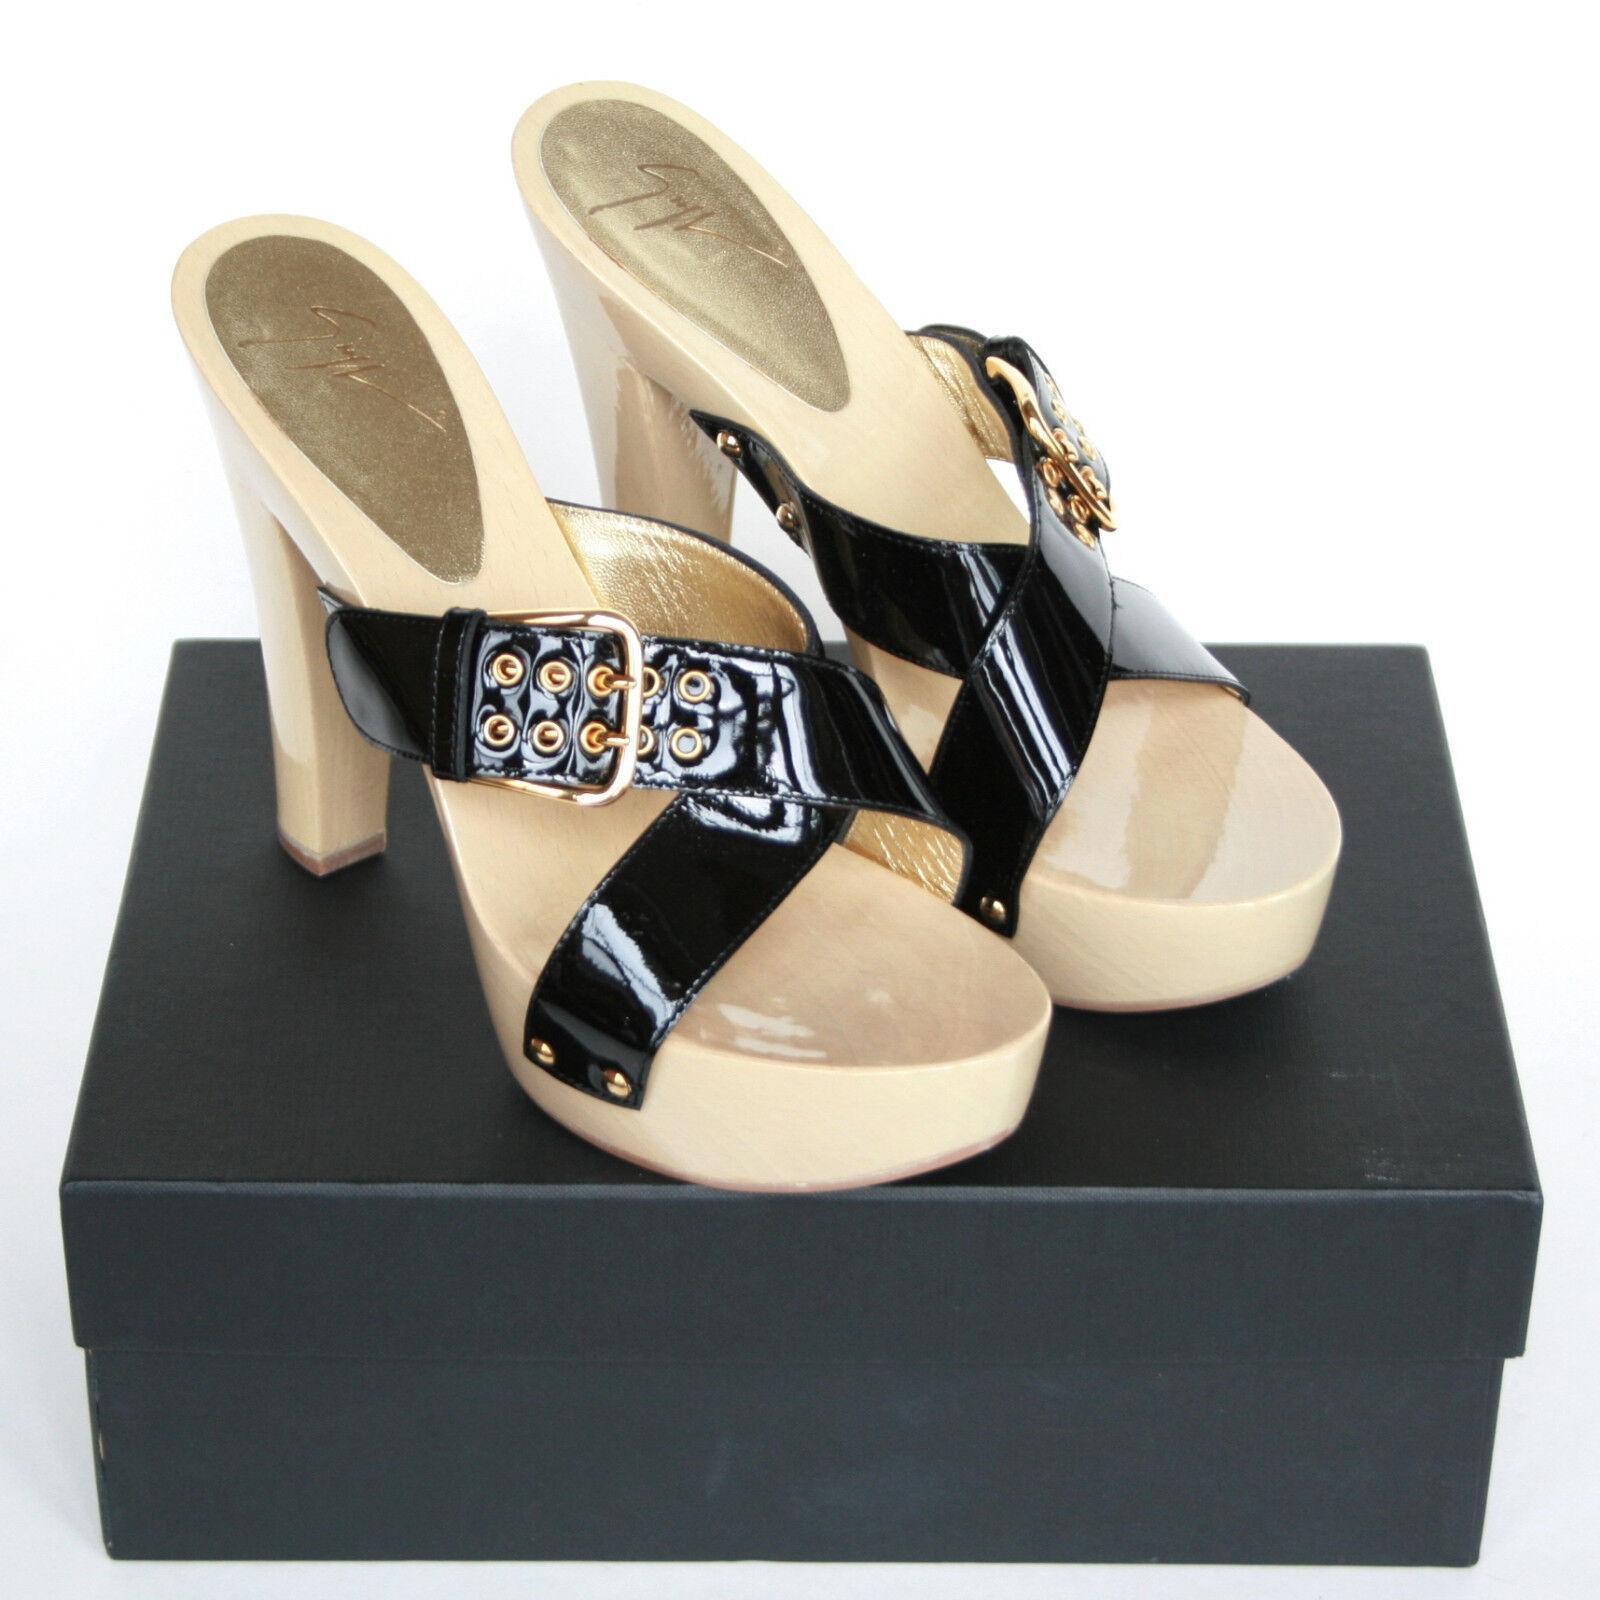 vendita all'ingrosso GIUSEPPE ZANOTTI  750 750 750 wood platform clogs patent leather sandal scarpe 38.5 NEW  più sconto